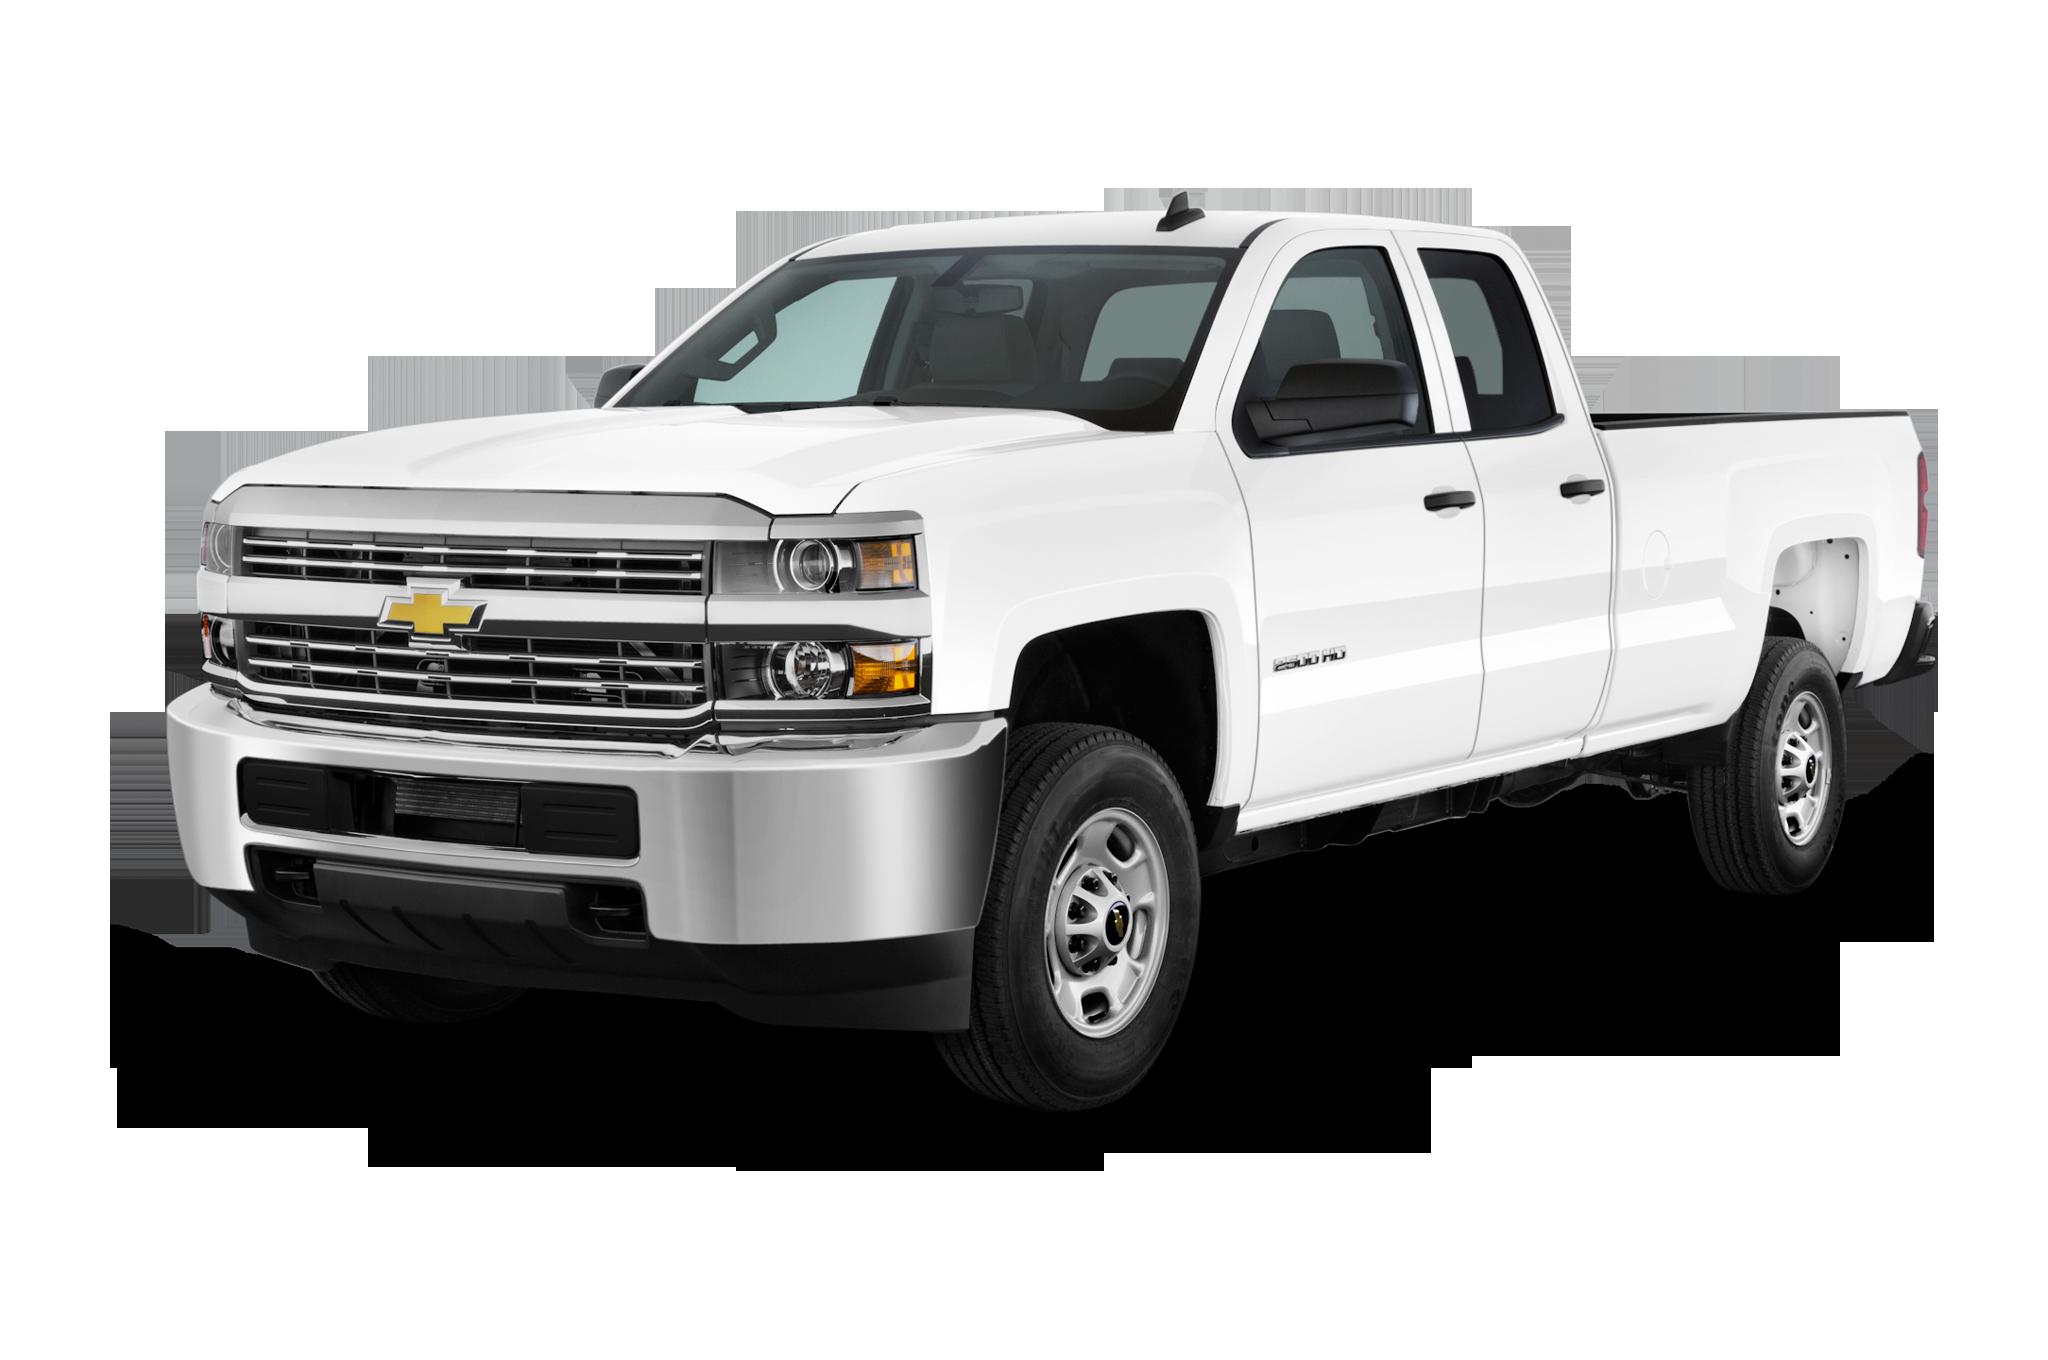 2017 Chevrolet Silverado HD Adds Functional Ram Air Hood ...